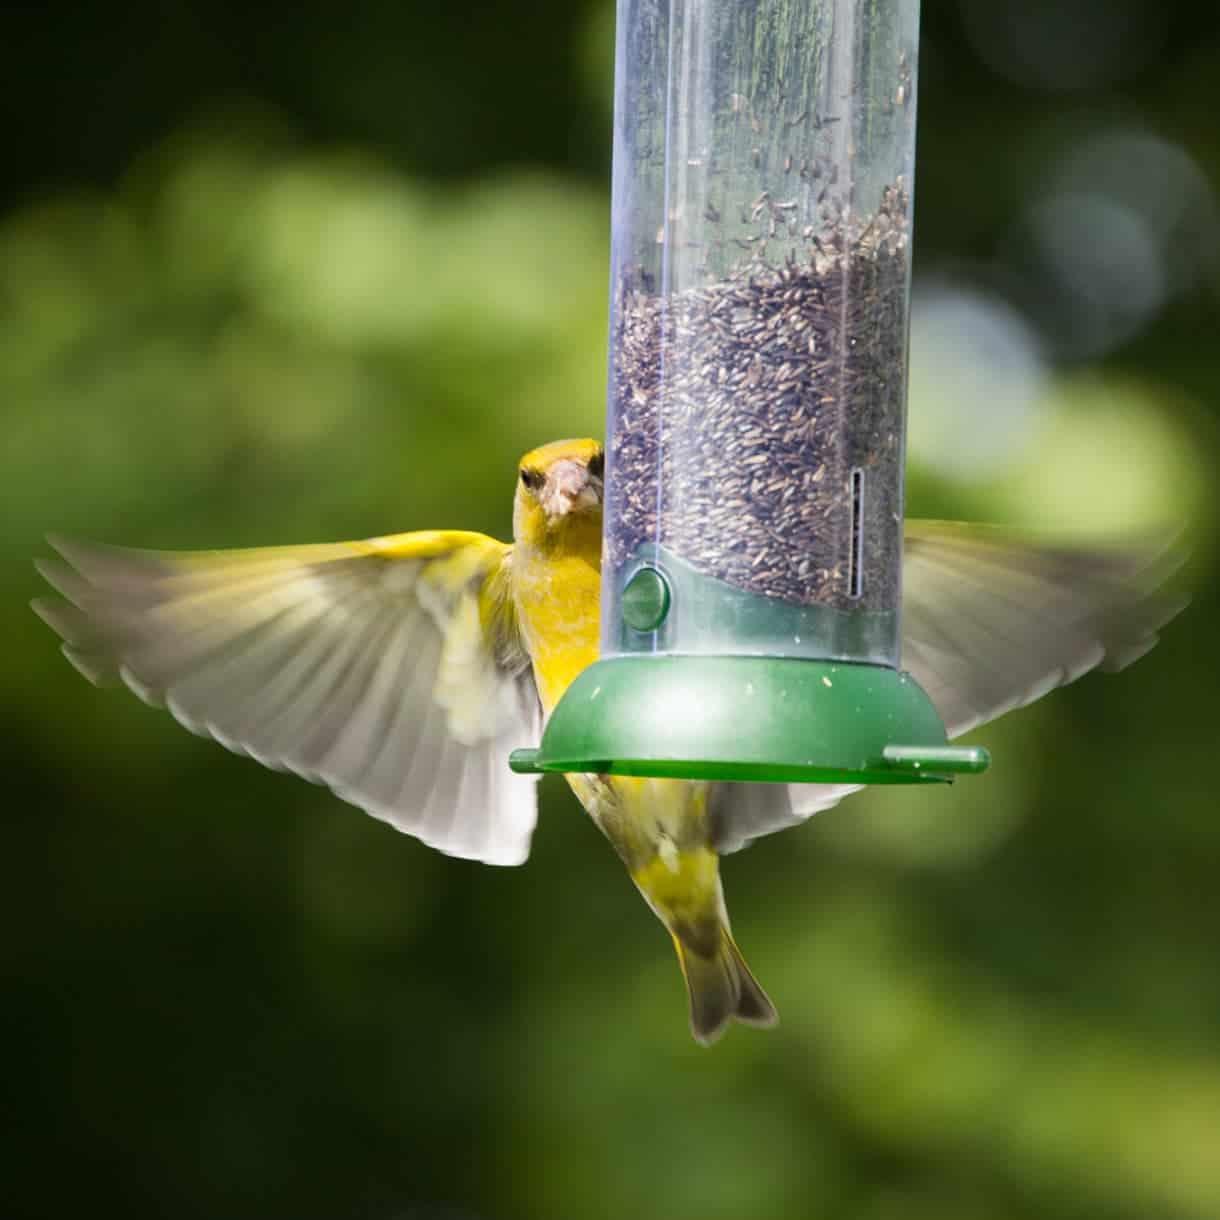 5 ways to minimise the spread of disease among garden birds